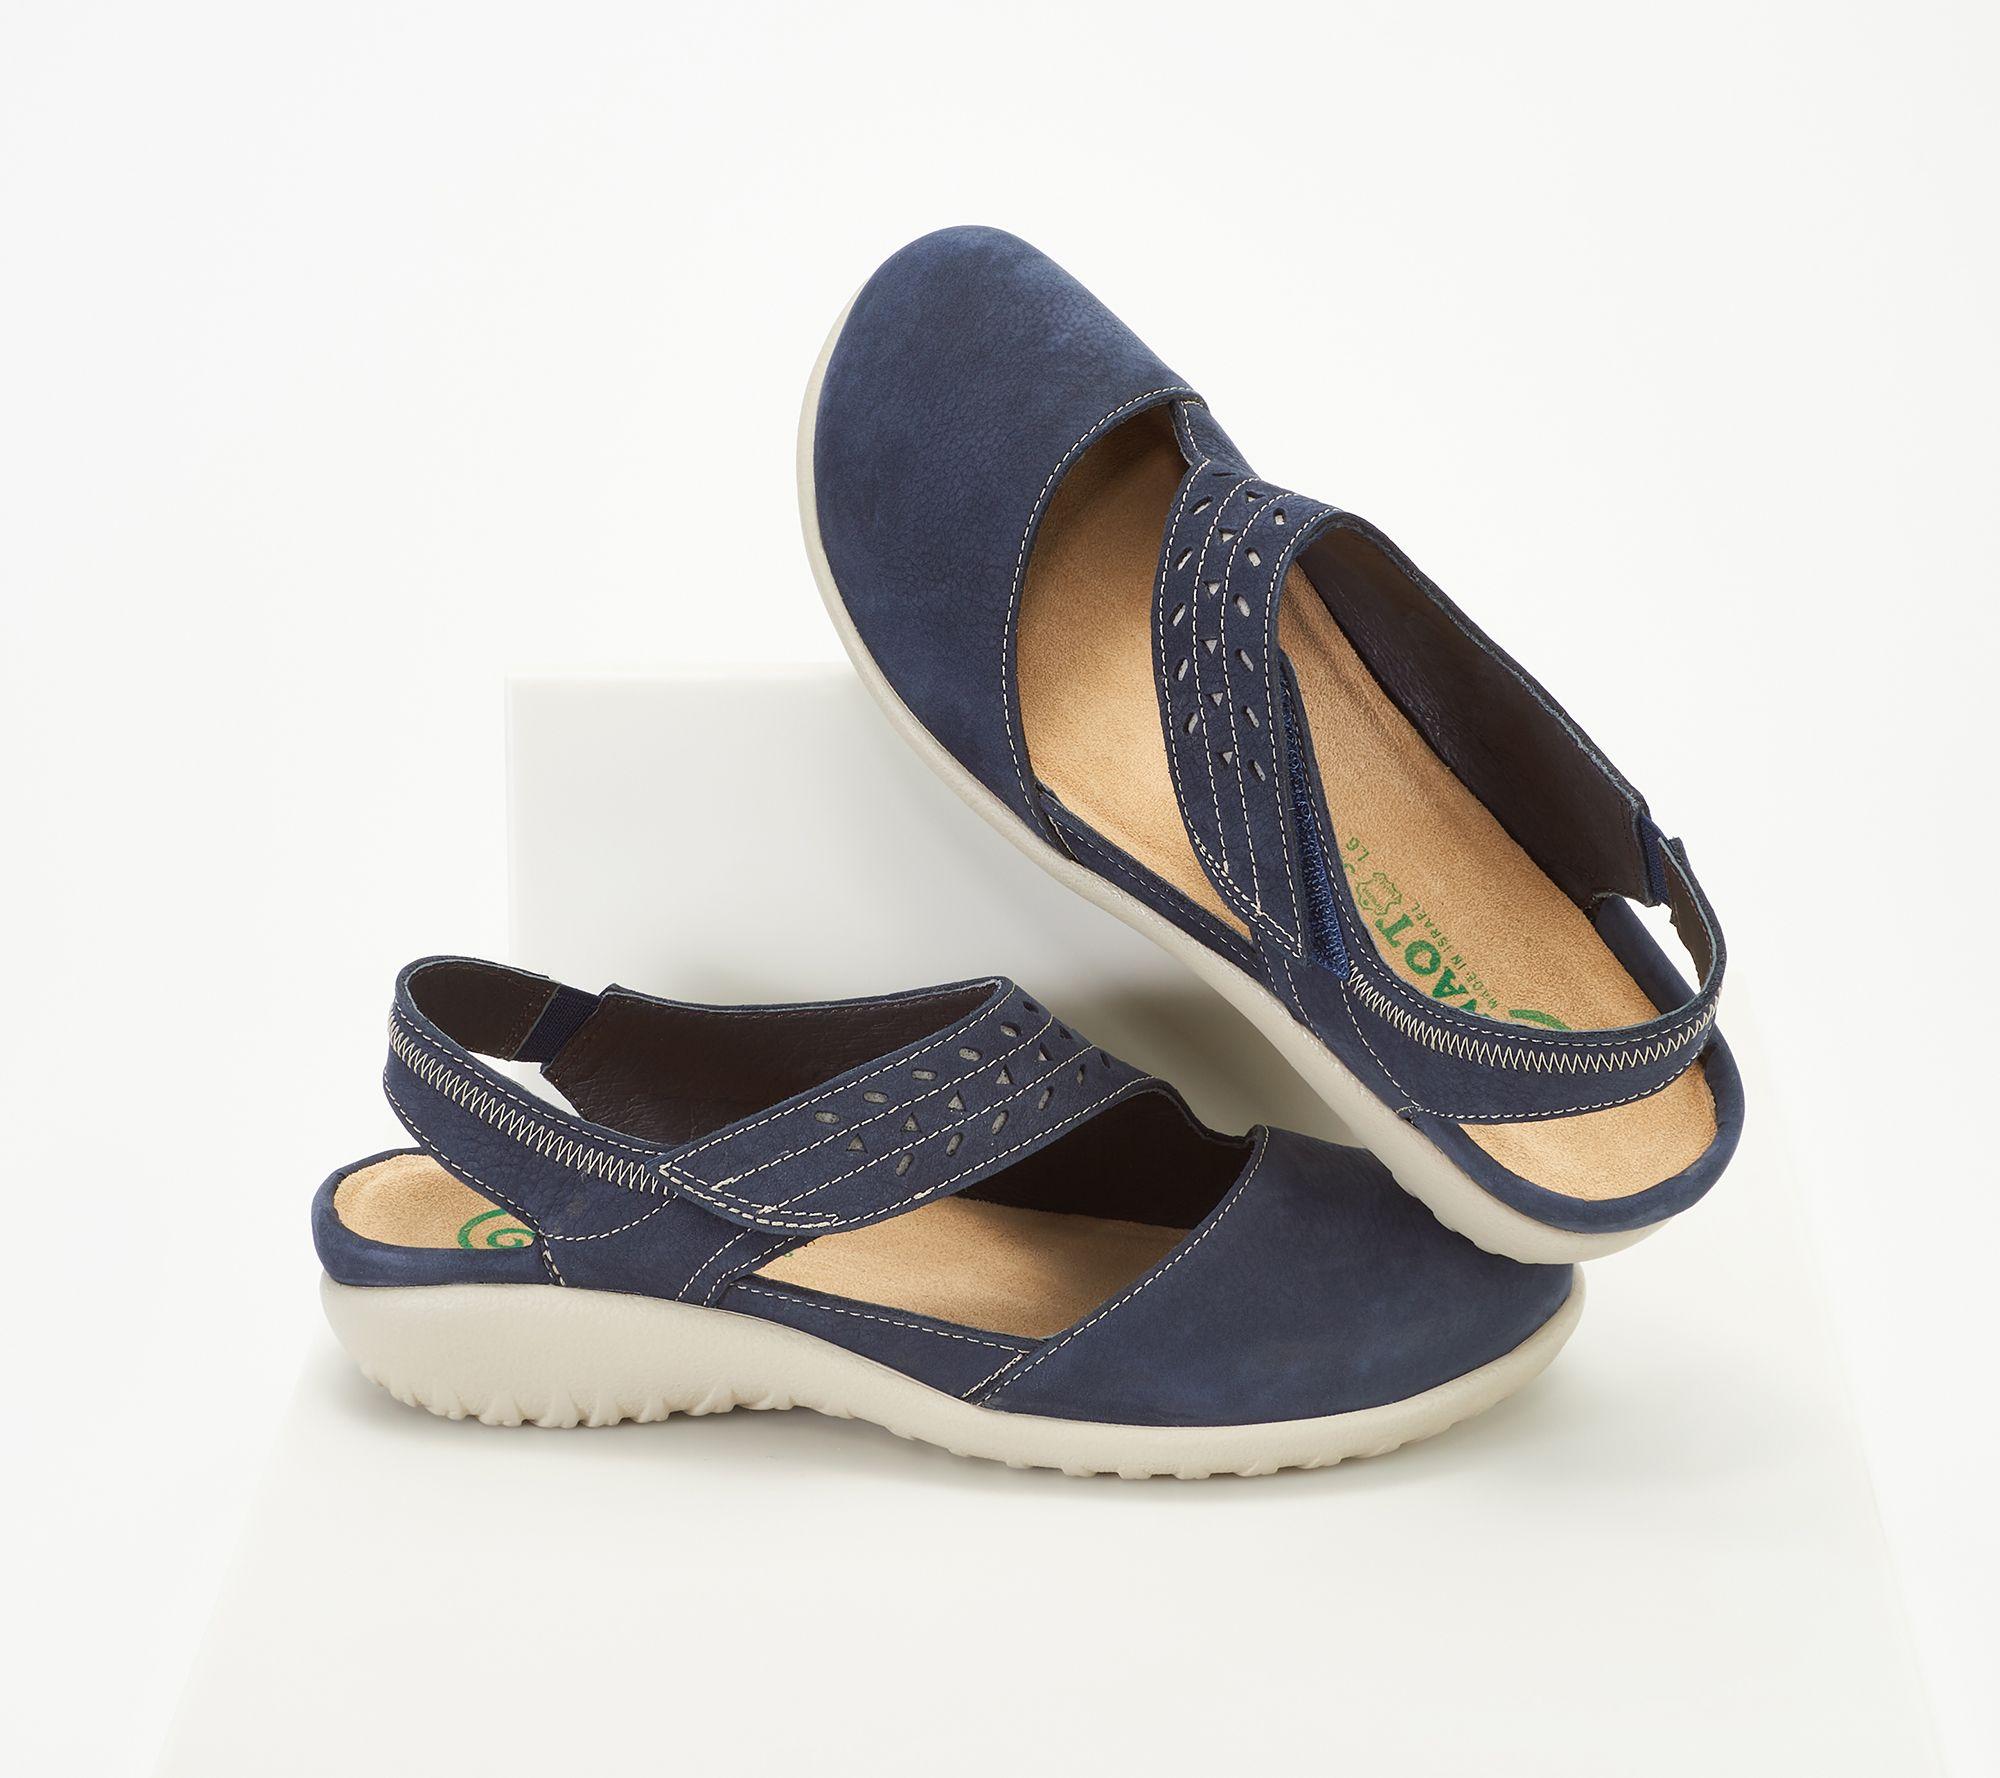 Naot Leather Backstrap Wedge Sandals - Kapua — QVC.com 982dbd84c39